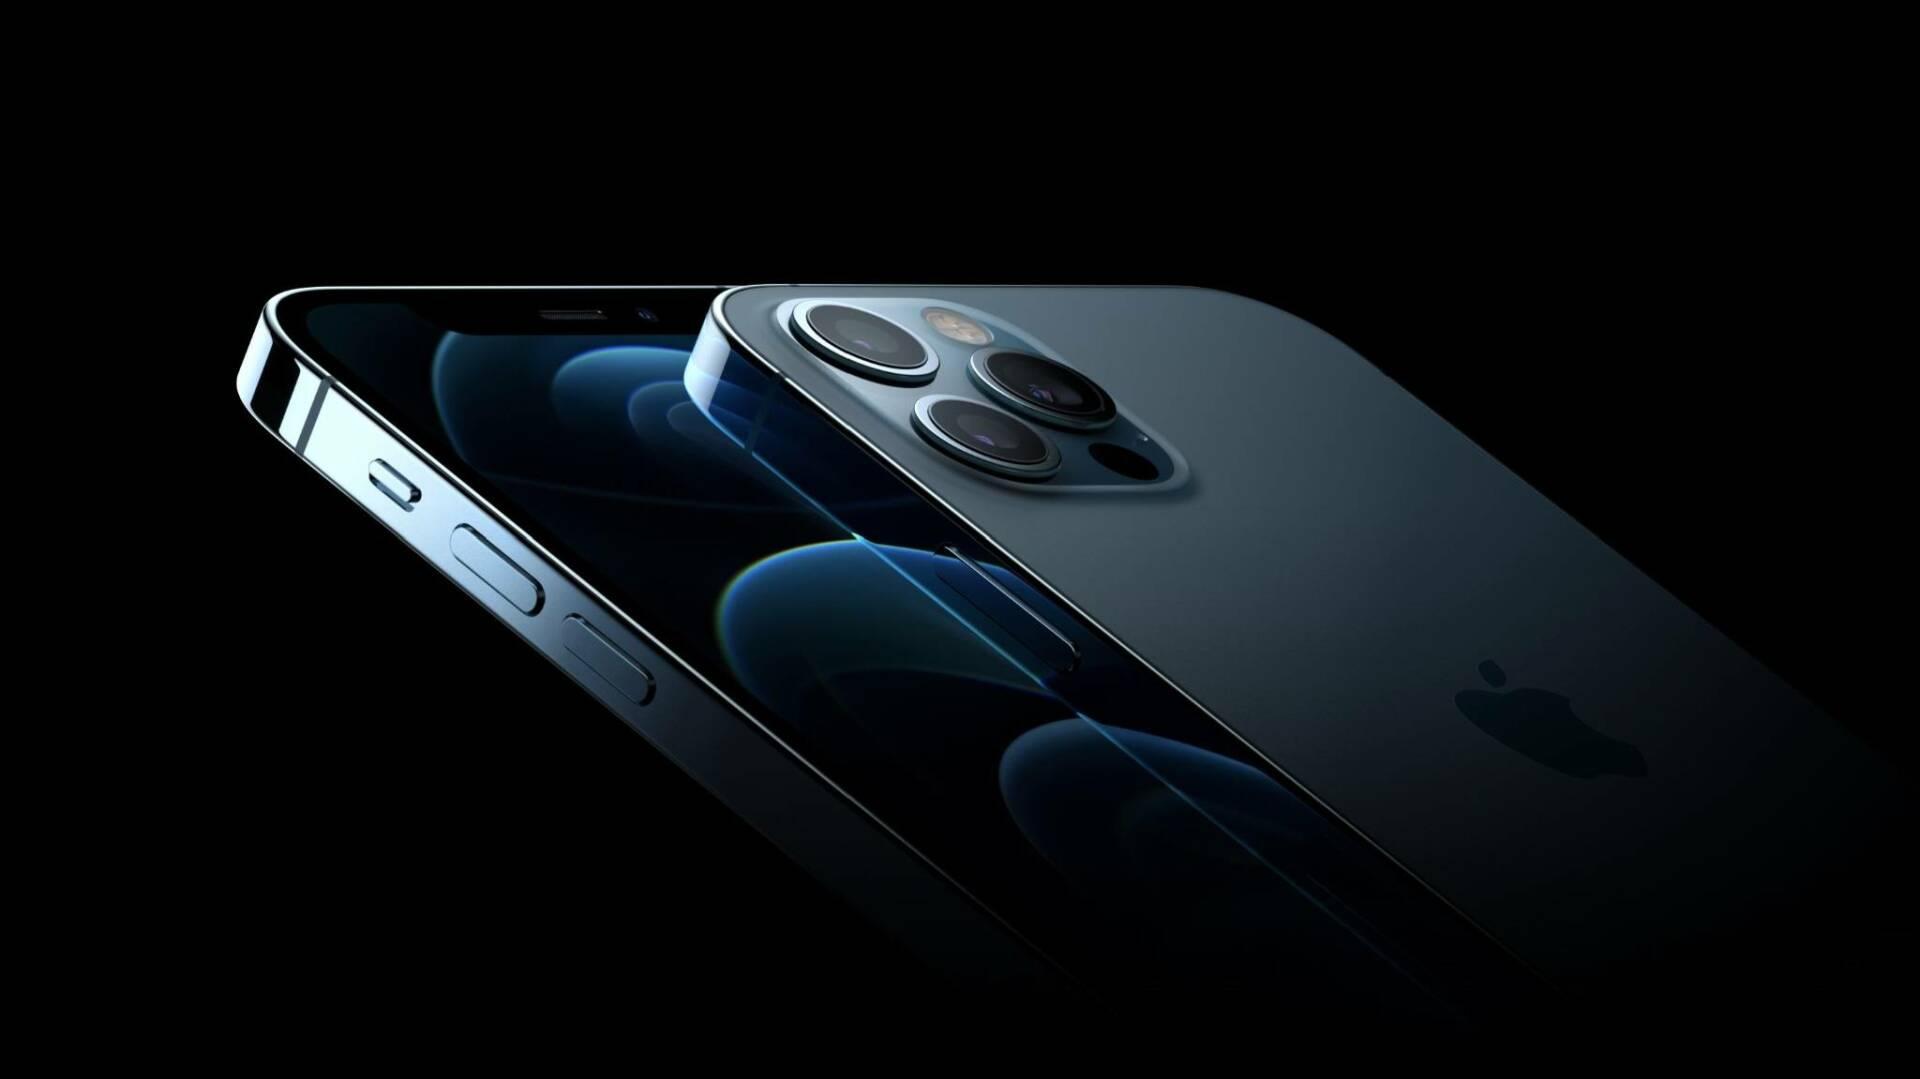 Apple iPhone 12 Pro / Max